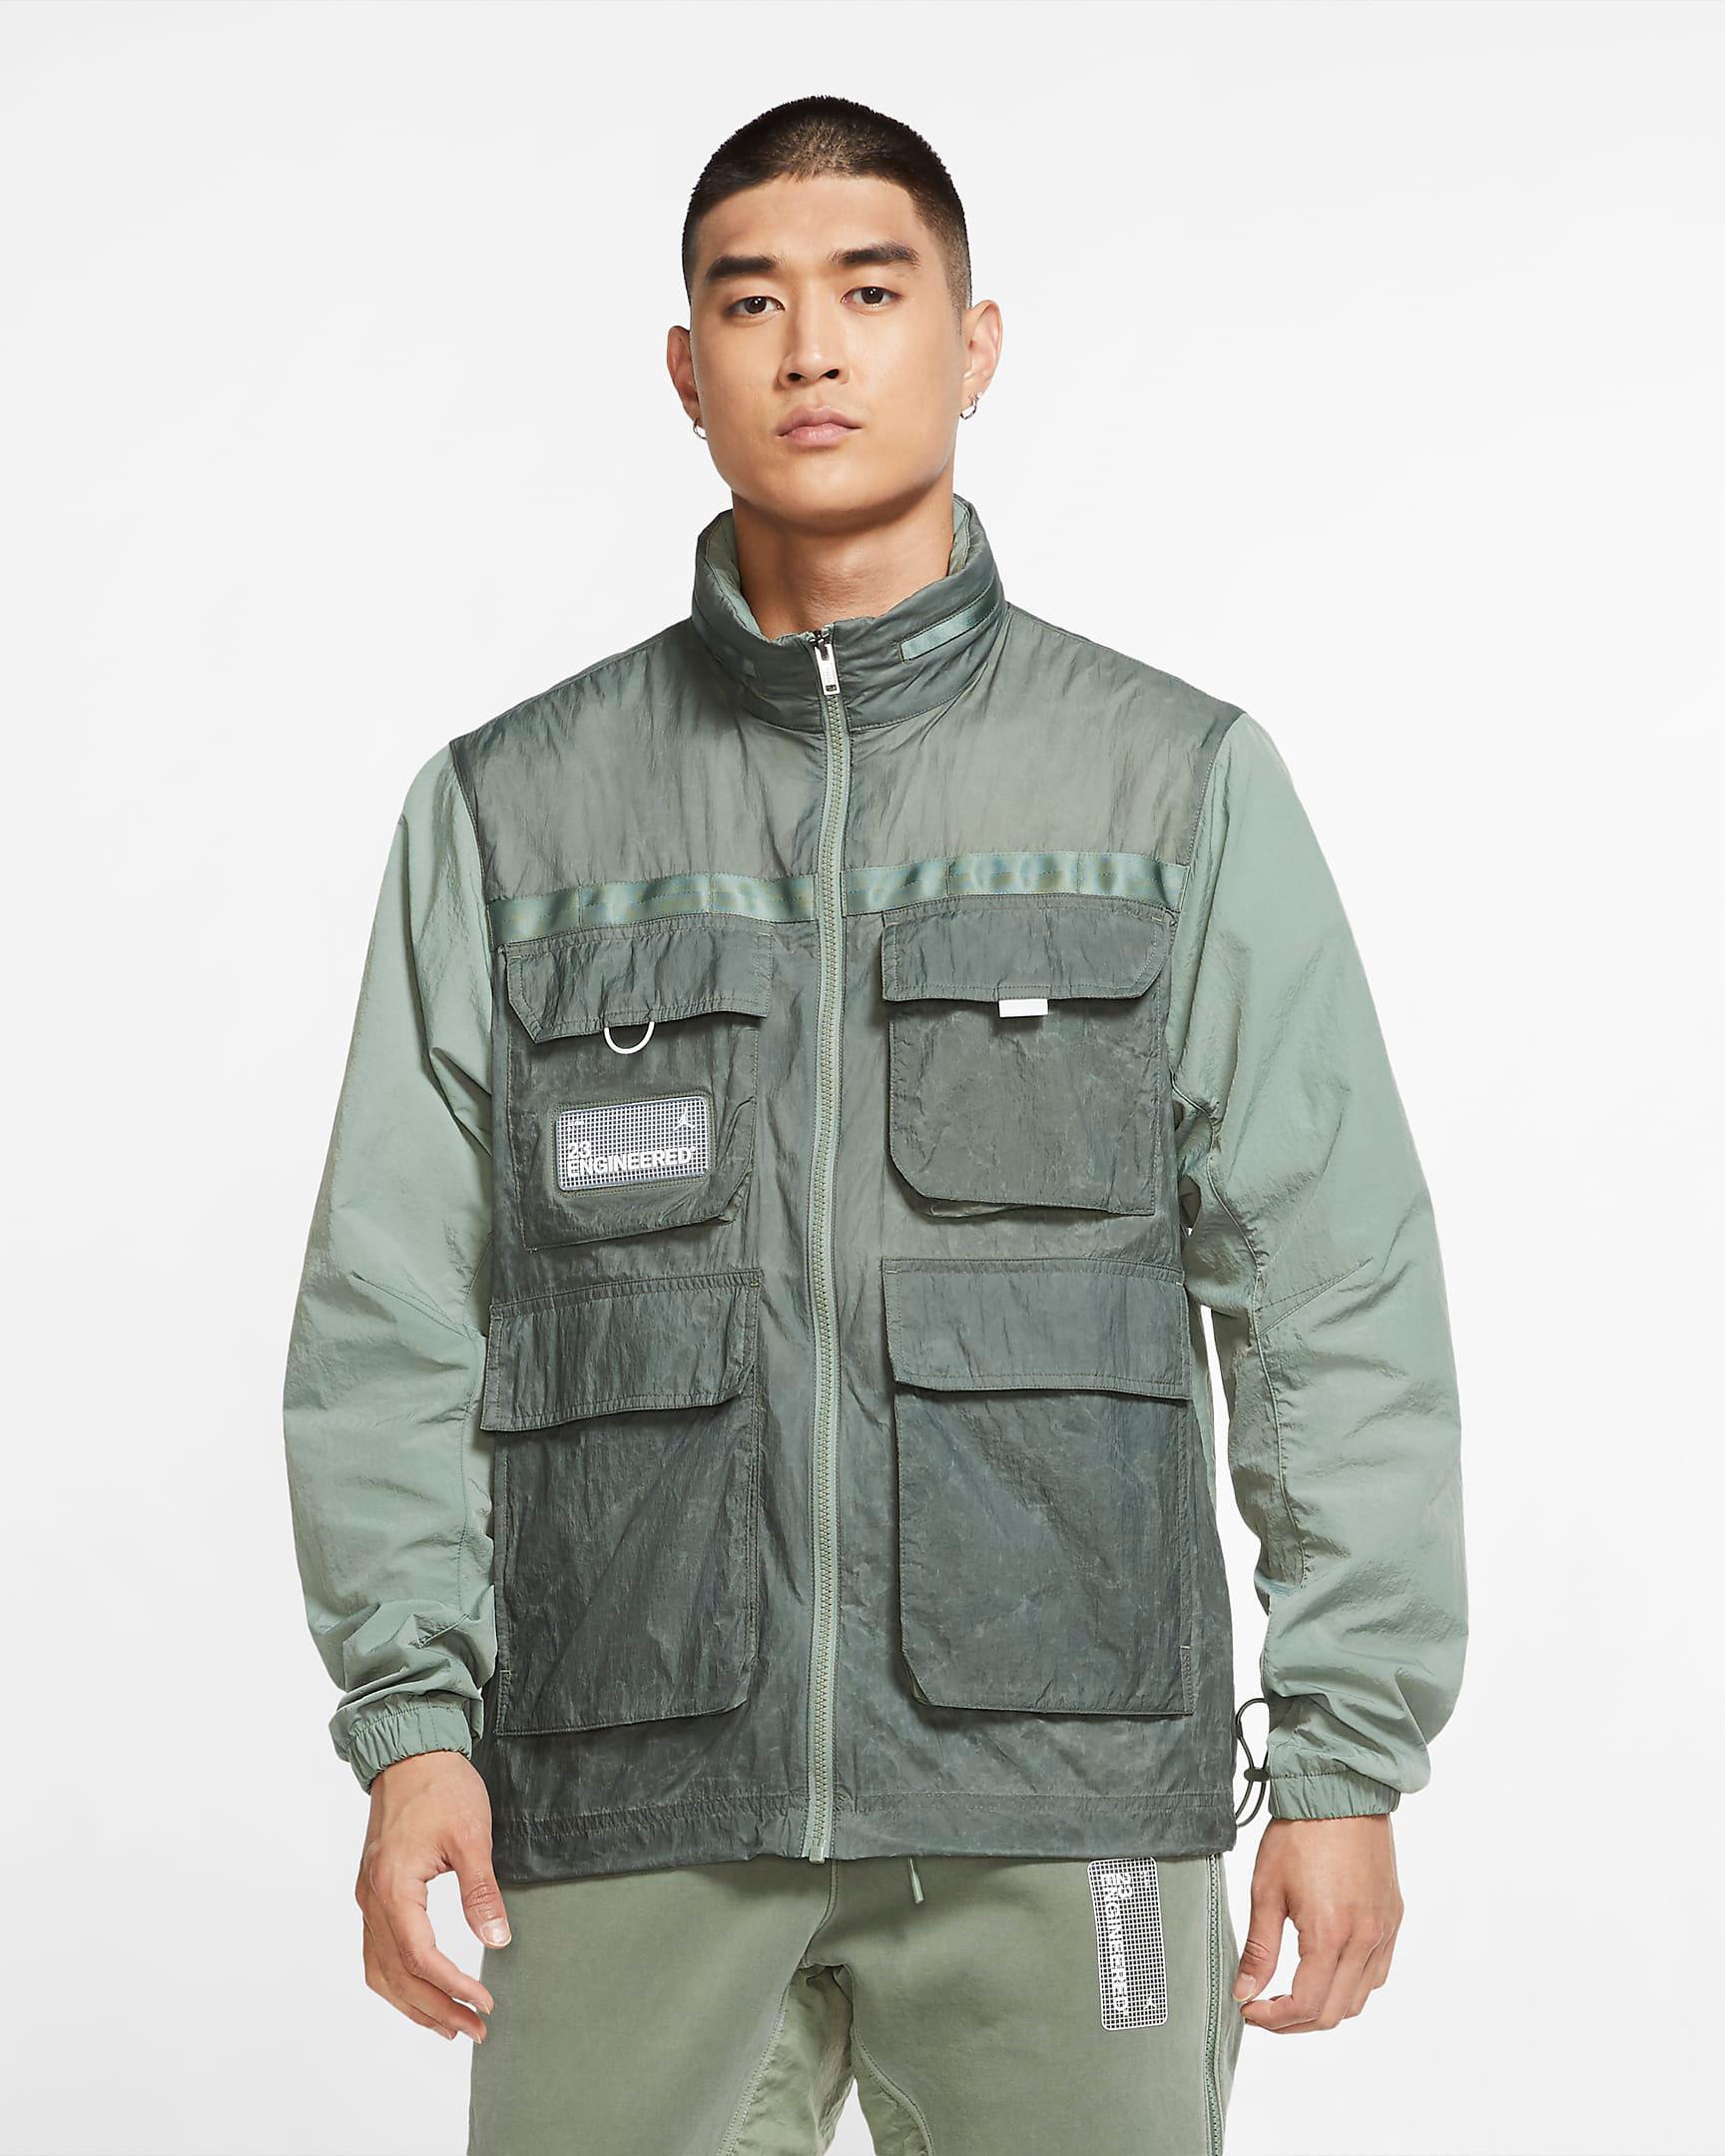 jordan-23-engineered-jacket-olive-green-1